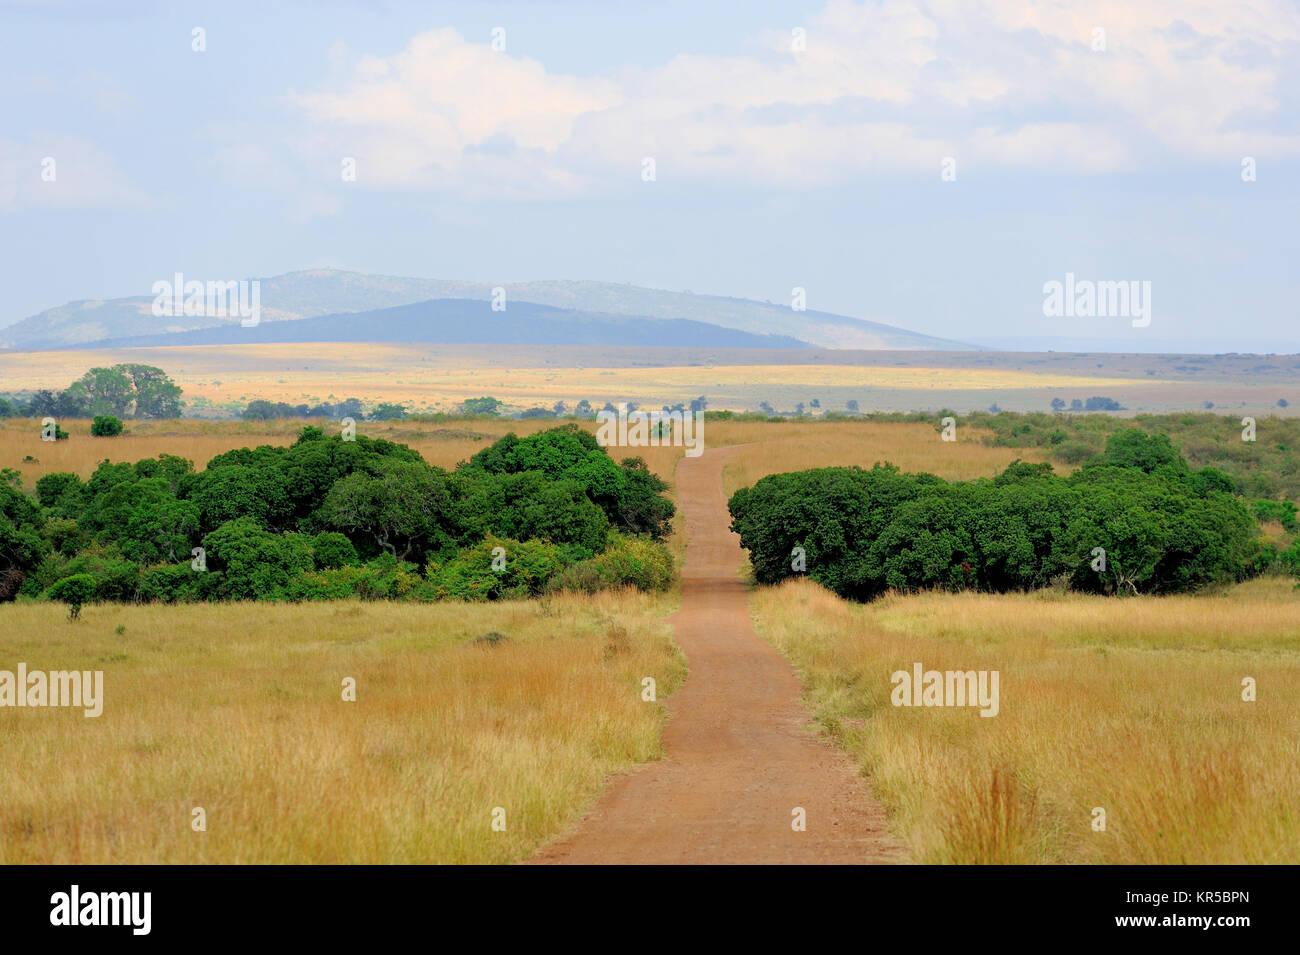 Savana paesaggio nel parco nazionale del Kenya, Africa Immagini Stock